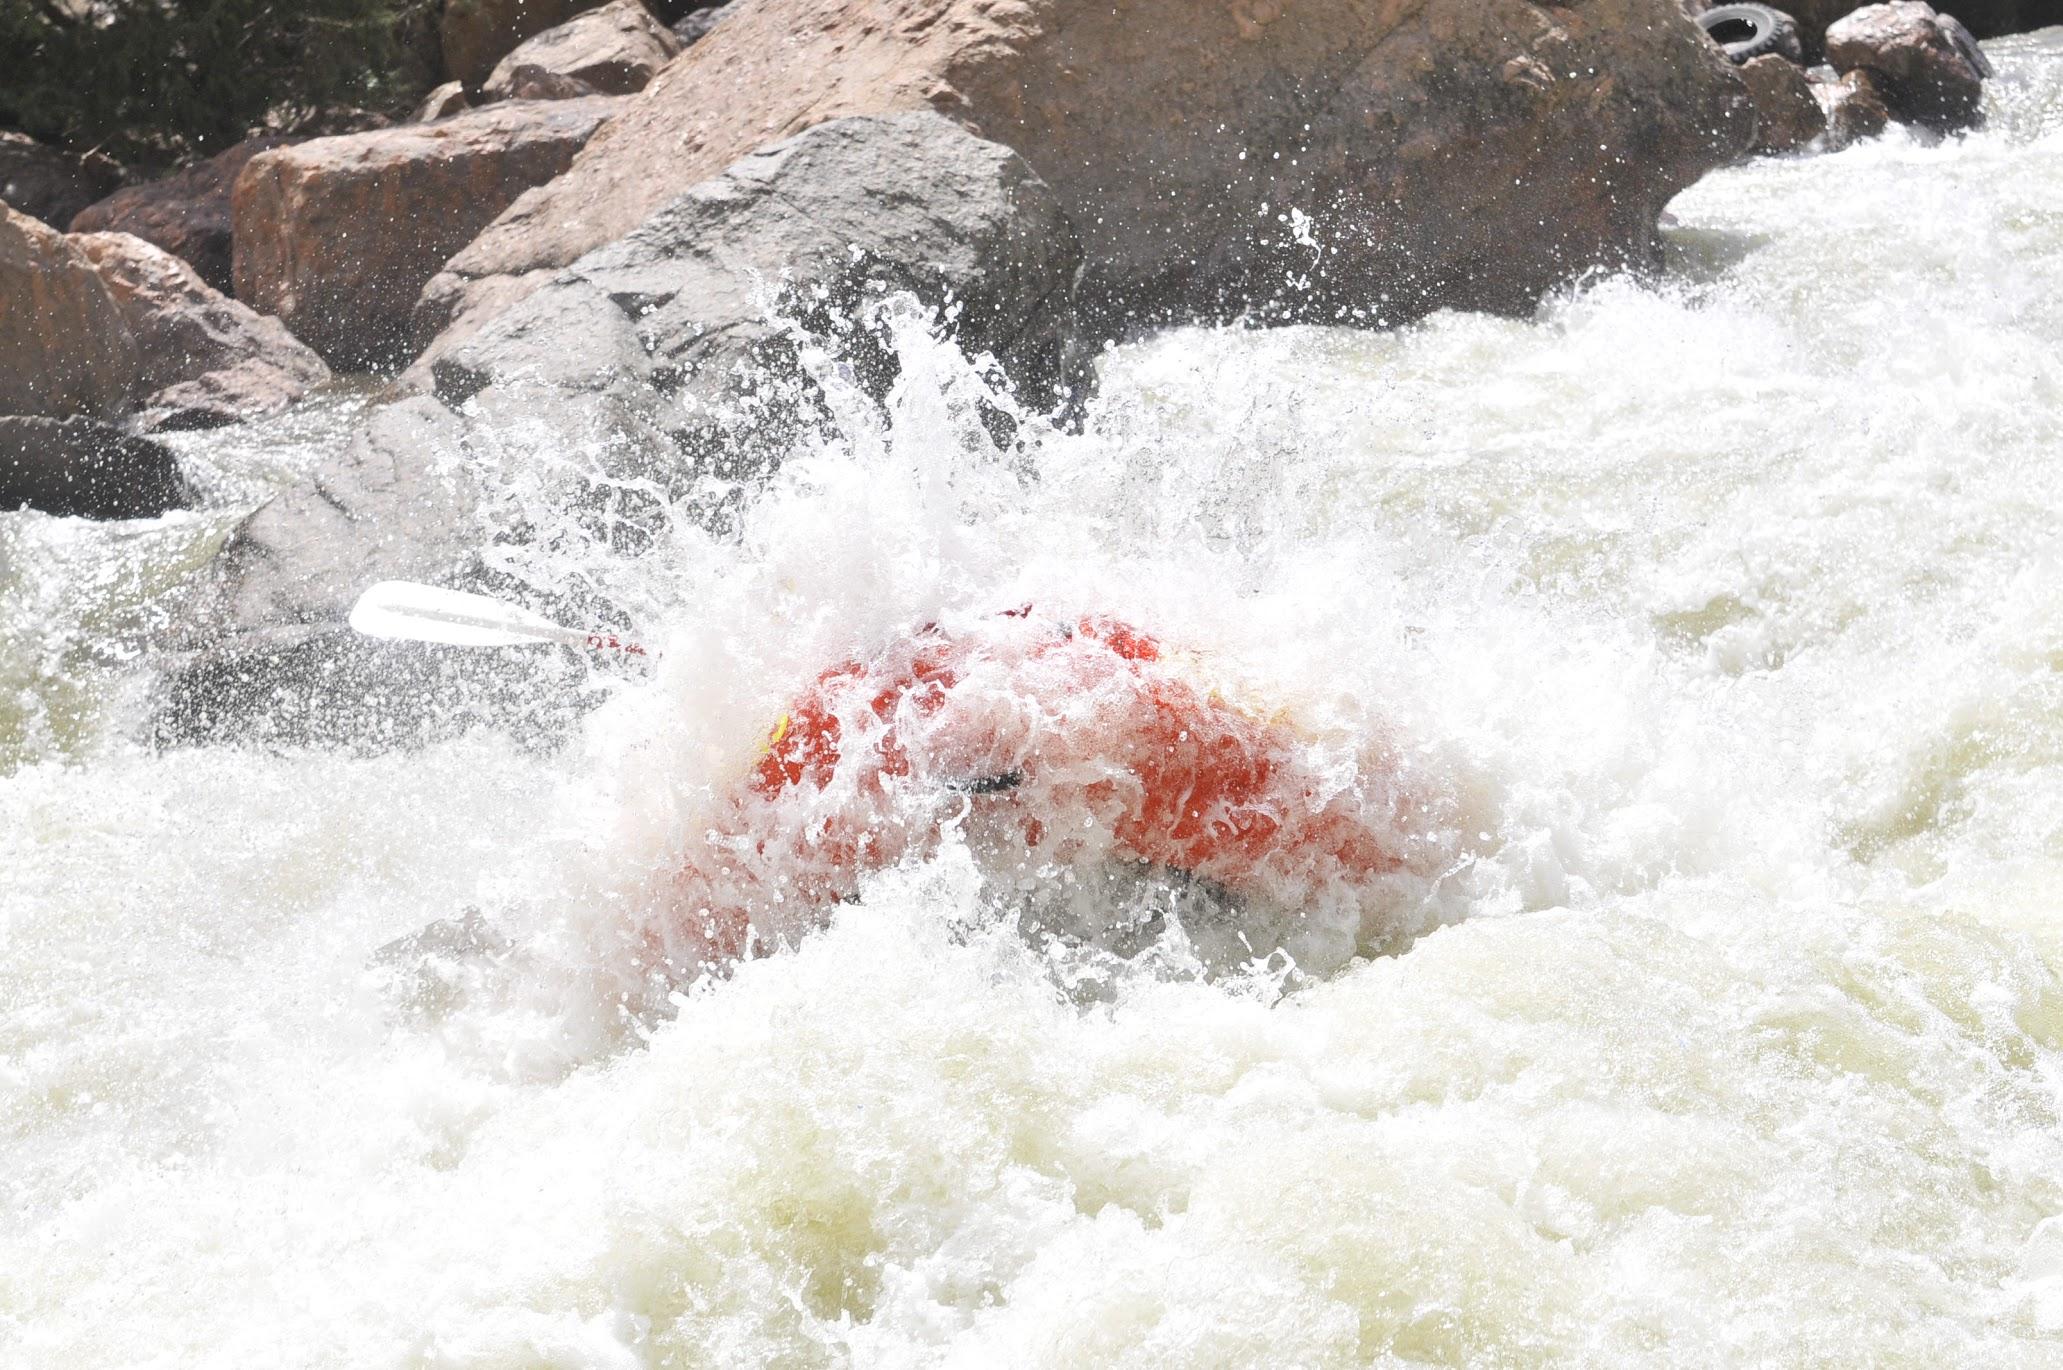 Royal Gorge Rafting 6